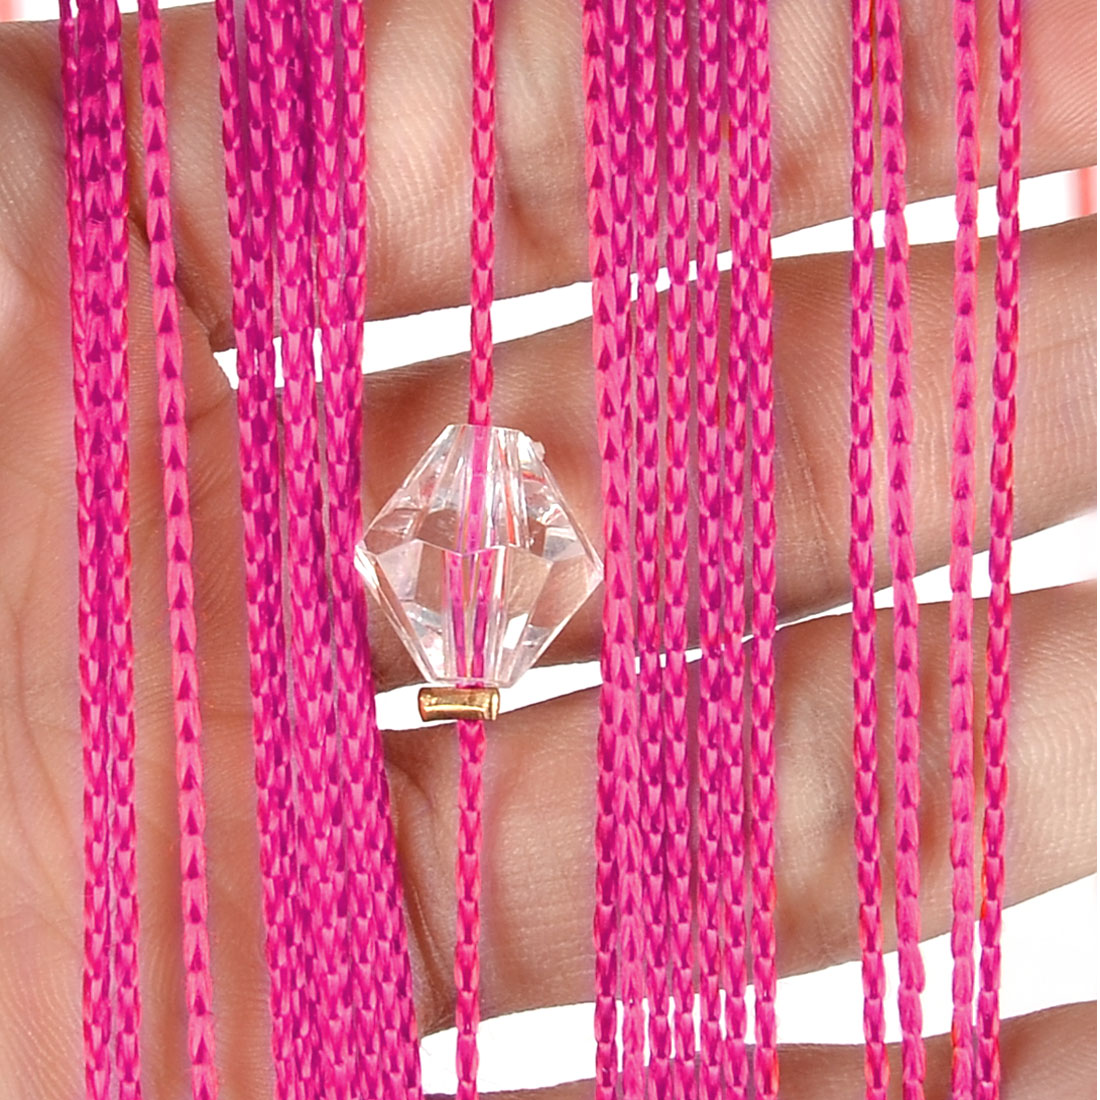 Home Decor Polyester Door Window String Bead Curtain Tassel Fuchsia 100 x 200cm - image 2 de 3